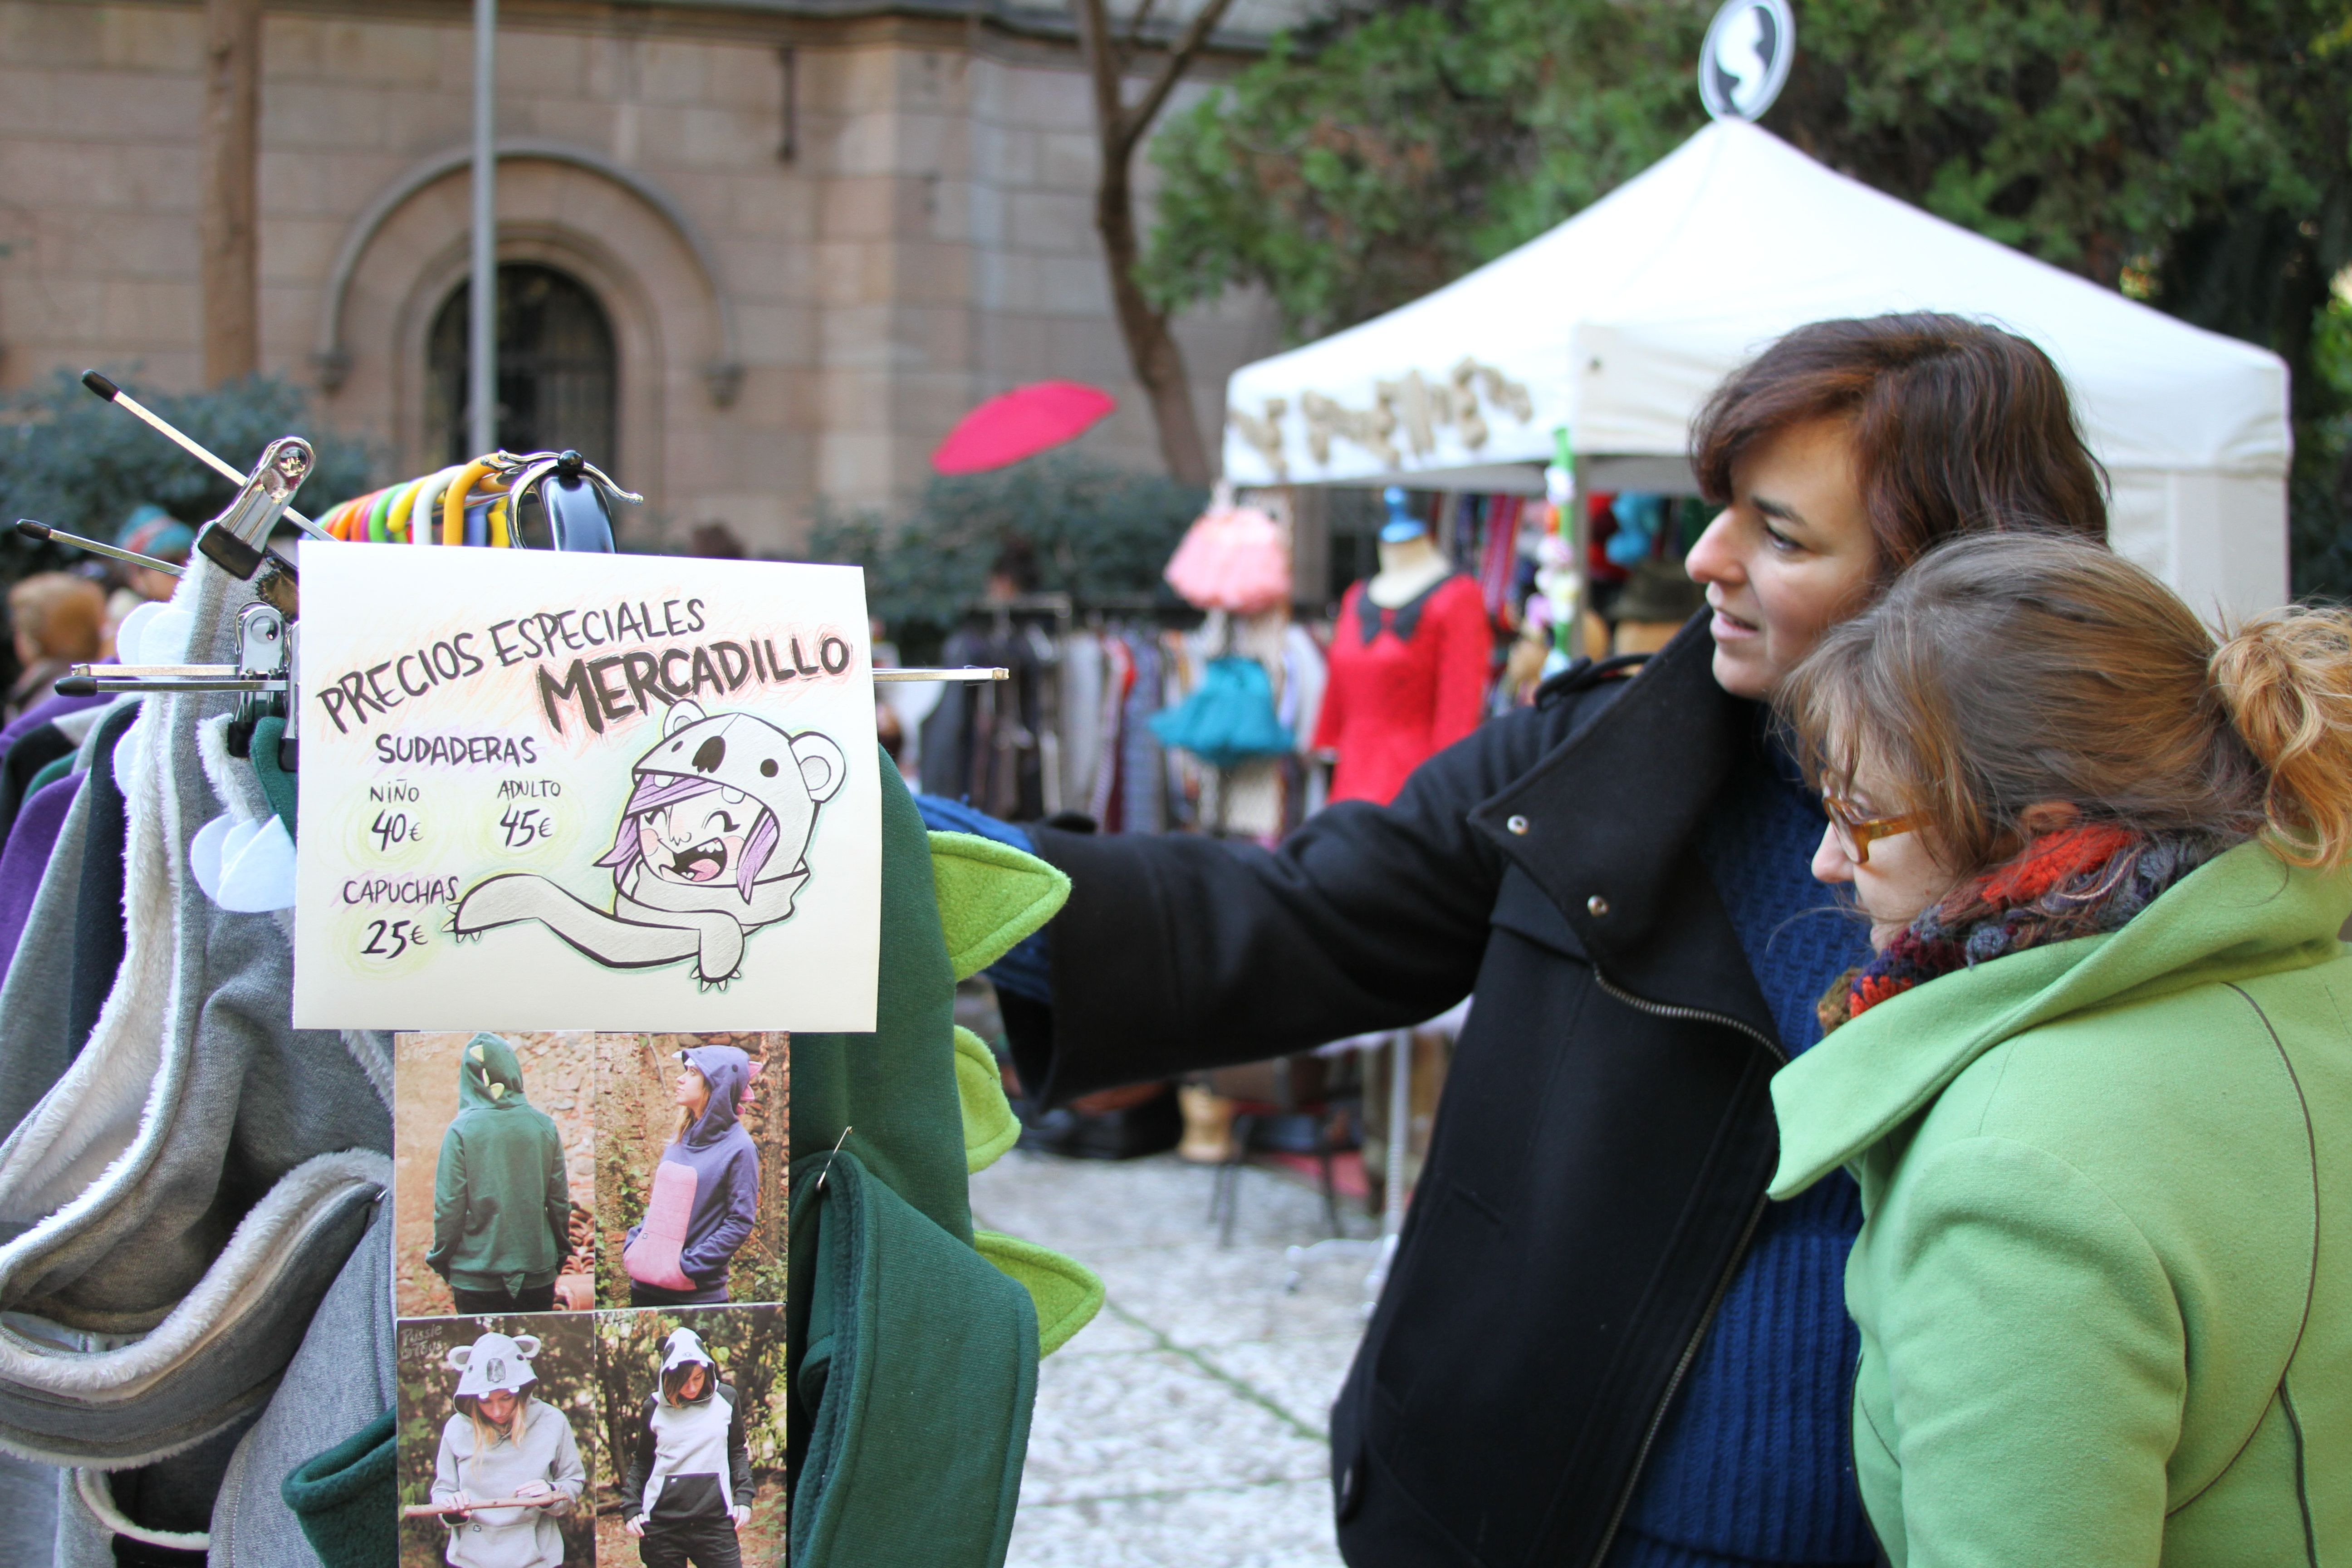 Marc Fernandez www.facebook.com/Markets2handvintageBarcelona